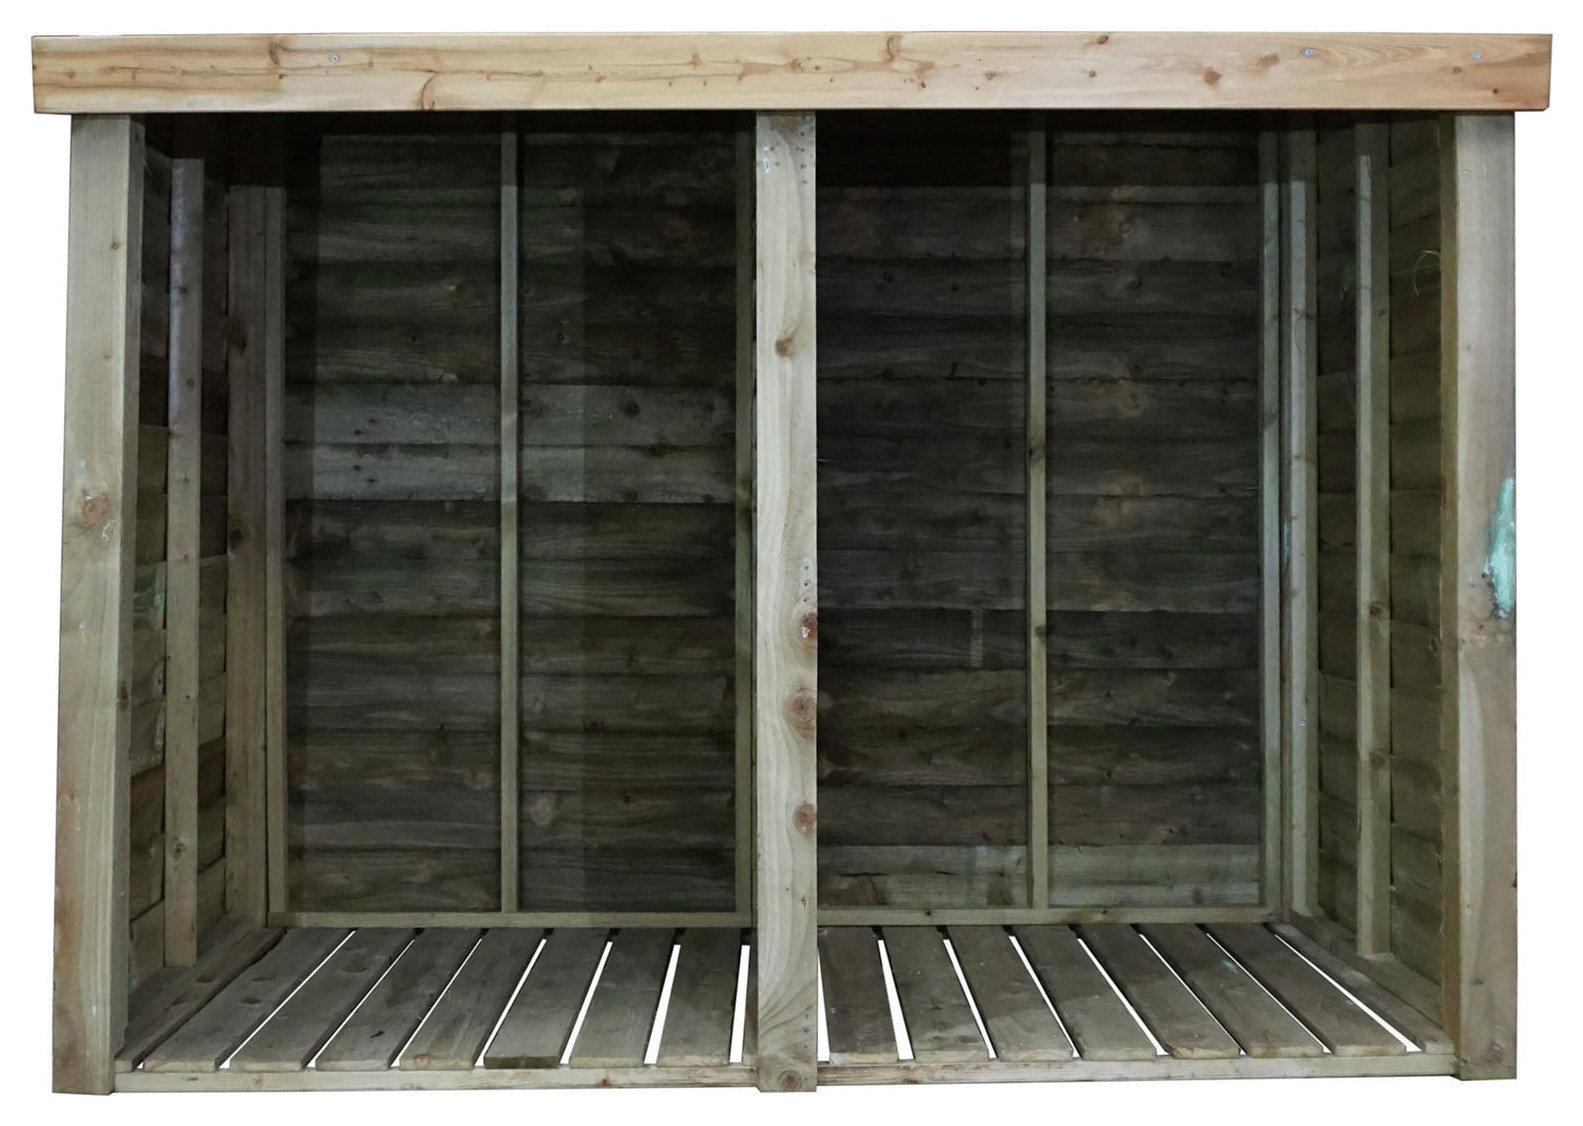 Image of Mercia 3ft x 7ft Pressure Treated Log Store.